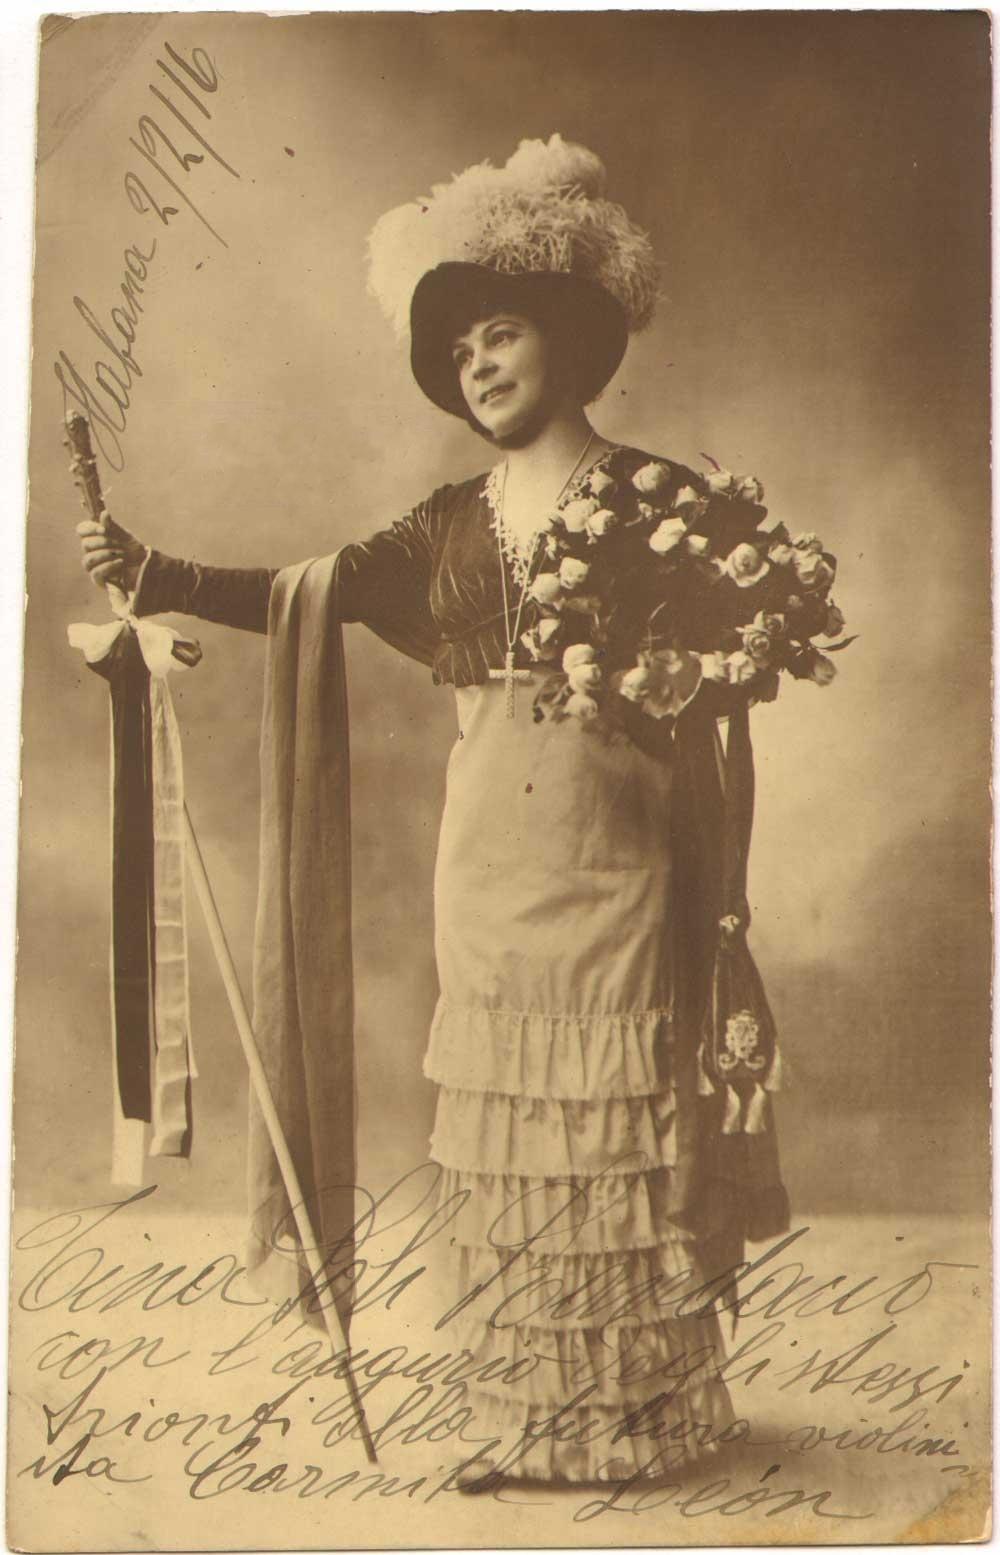 ITALIAN SOPRANO TINA POLI RANDACCIO (1879 - 1956) CD